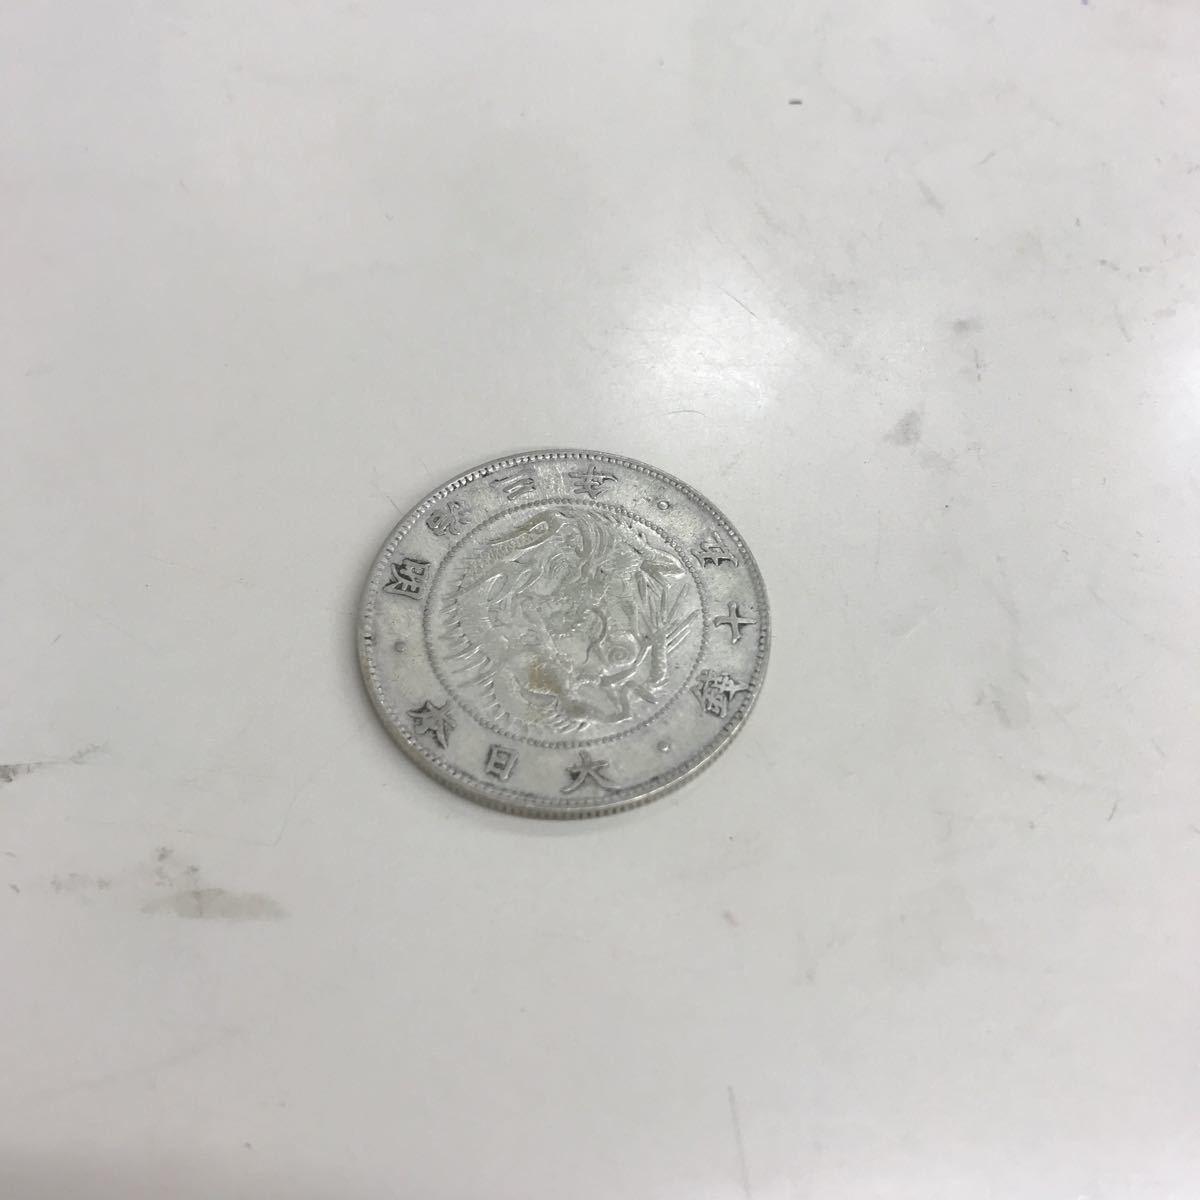 C418 【アンティーク】旭日竜大型50銭銀貨 明治3年_画像1